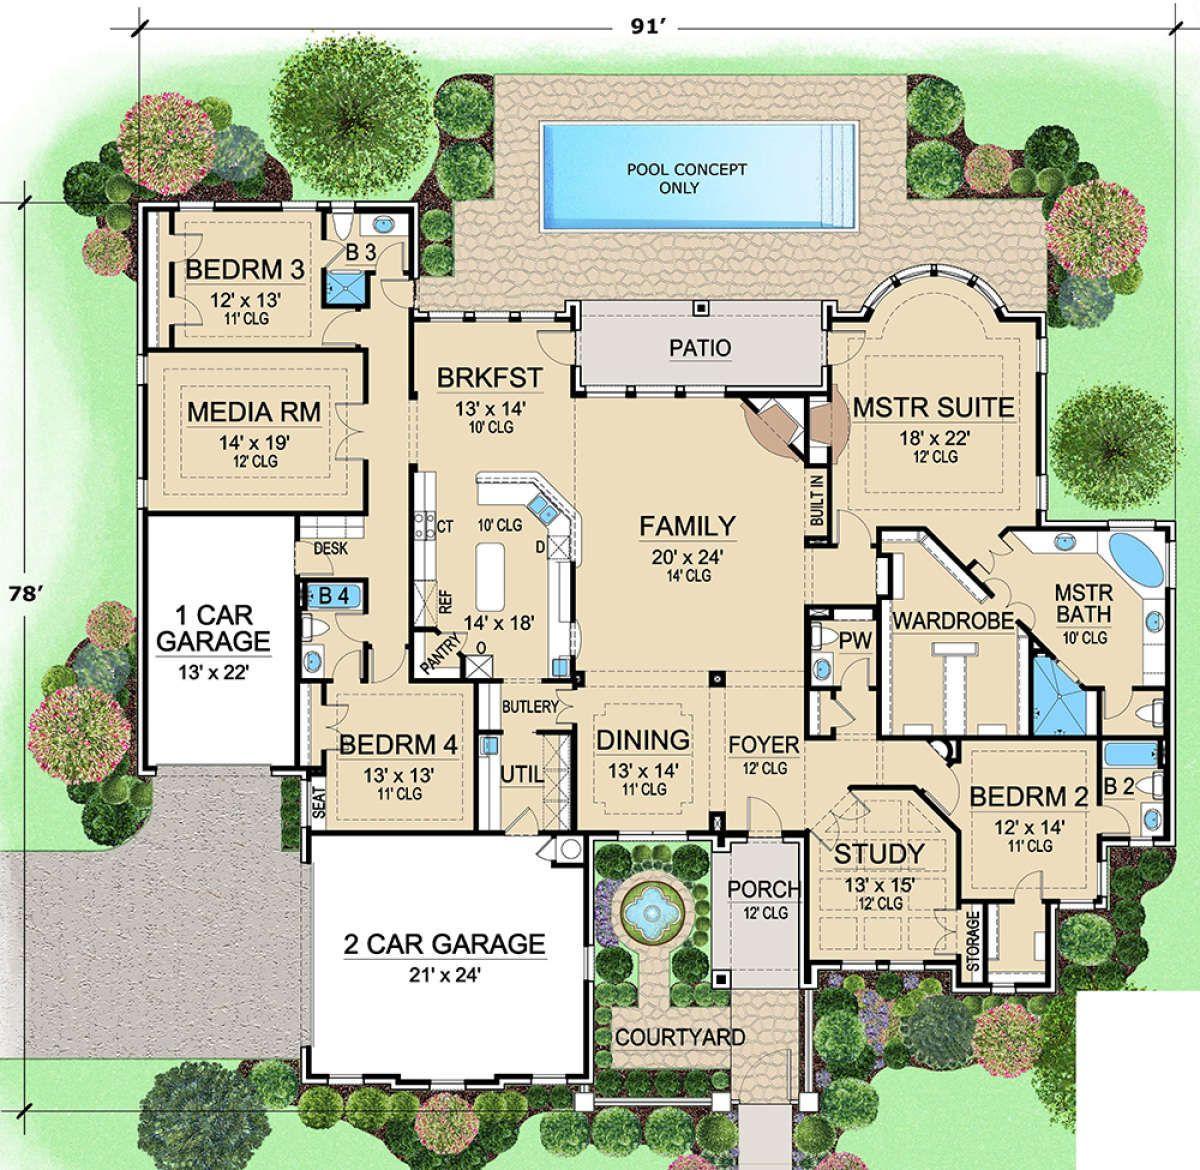 House Plan 5445 00323 European Plan 4 045 Square Feet 4 Bedrooms 4 5 Bathrooms House Floor Plans House Layouts House Plans